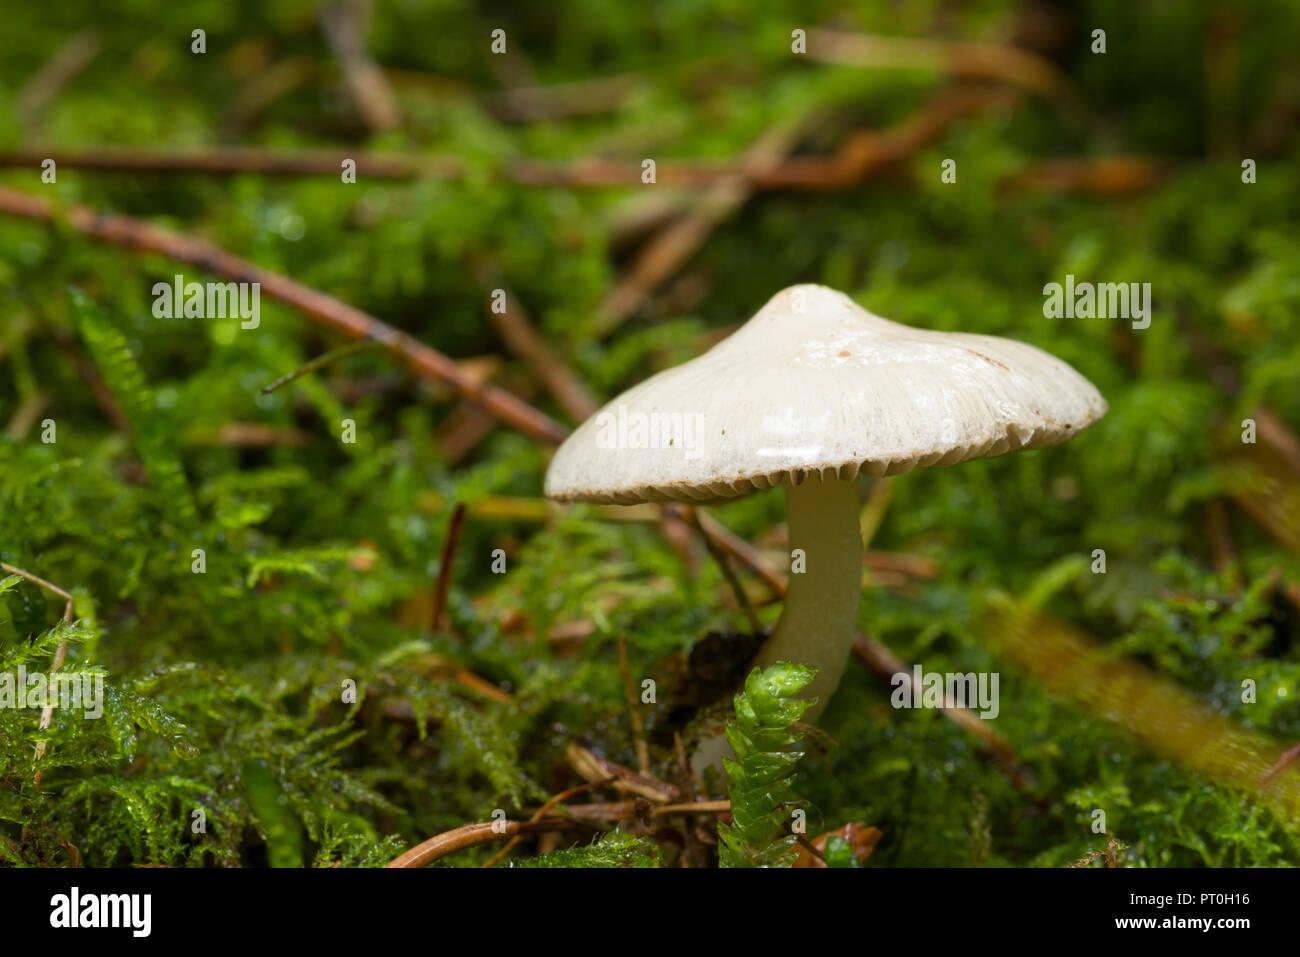 White Fibercap (Inocybe geophylla) mushroom also known as Earthy Inocybe. Common White Inocybe and White Fibercap. Stockhill Wood, Somerset, England. - Stock Image